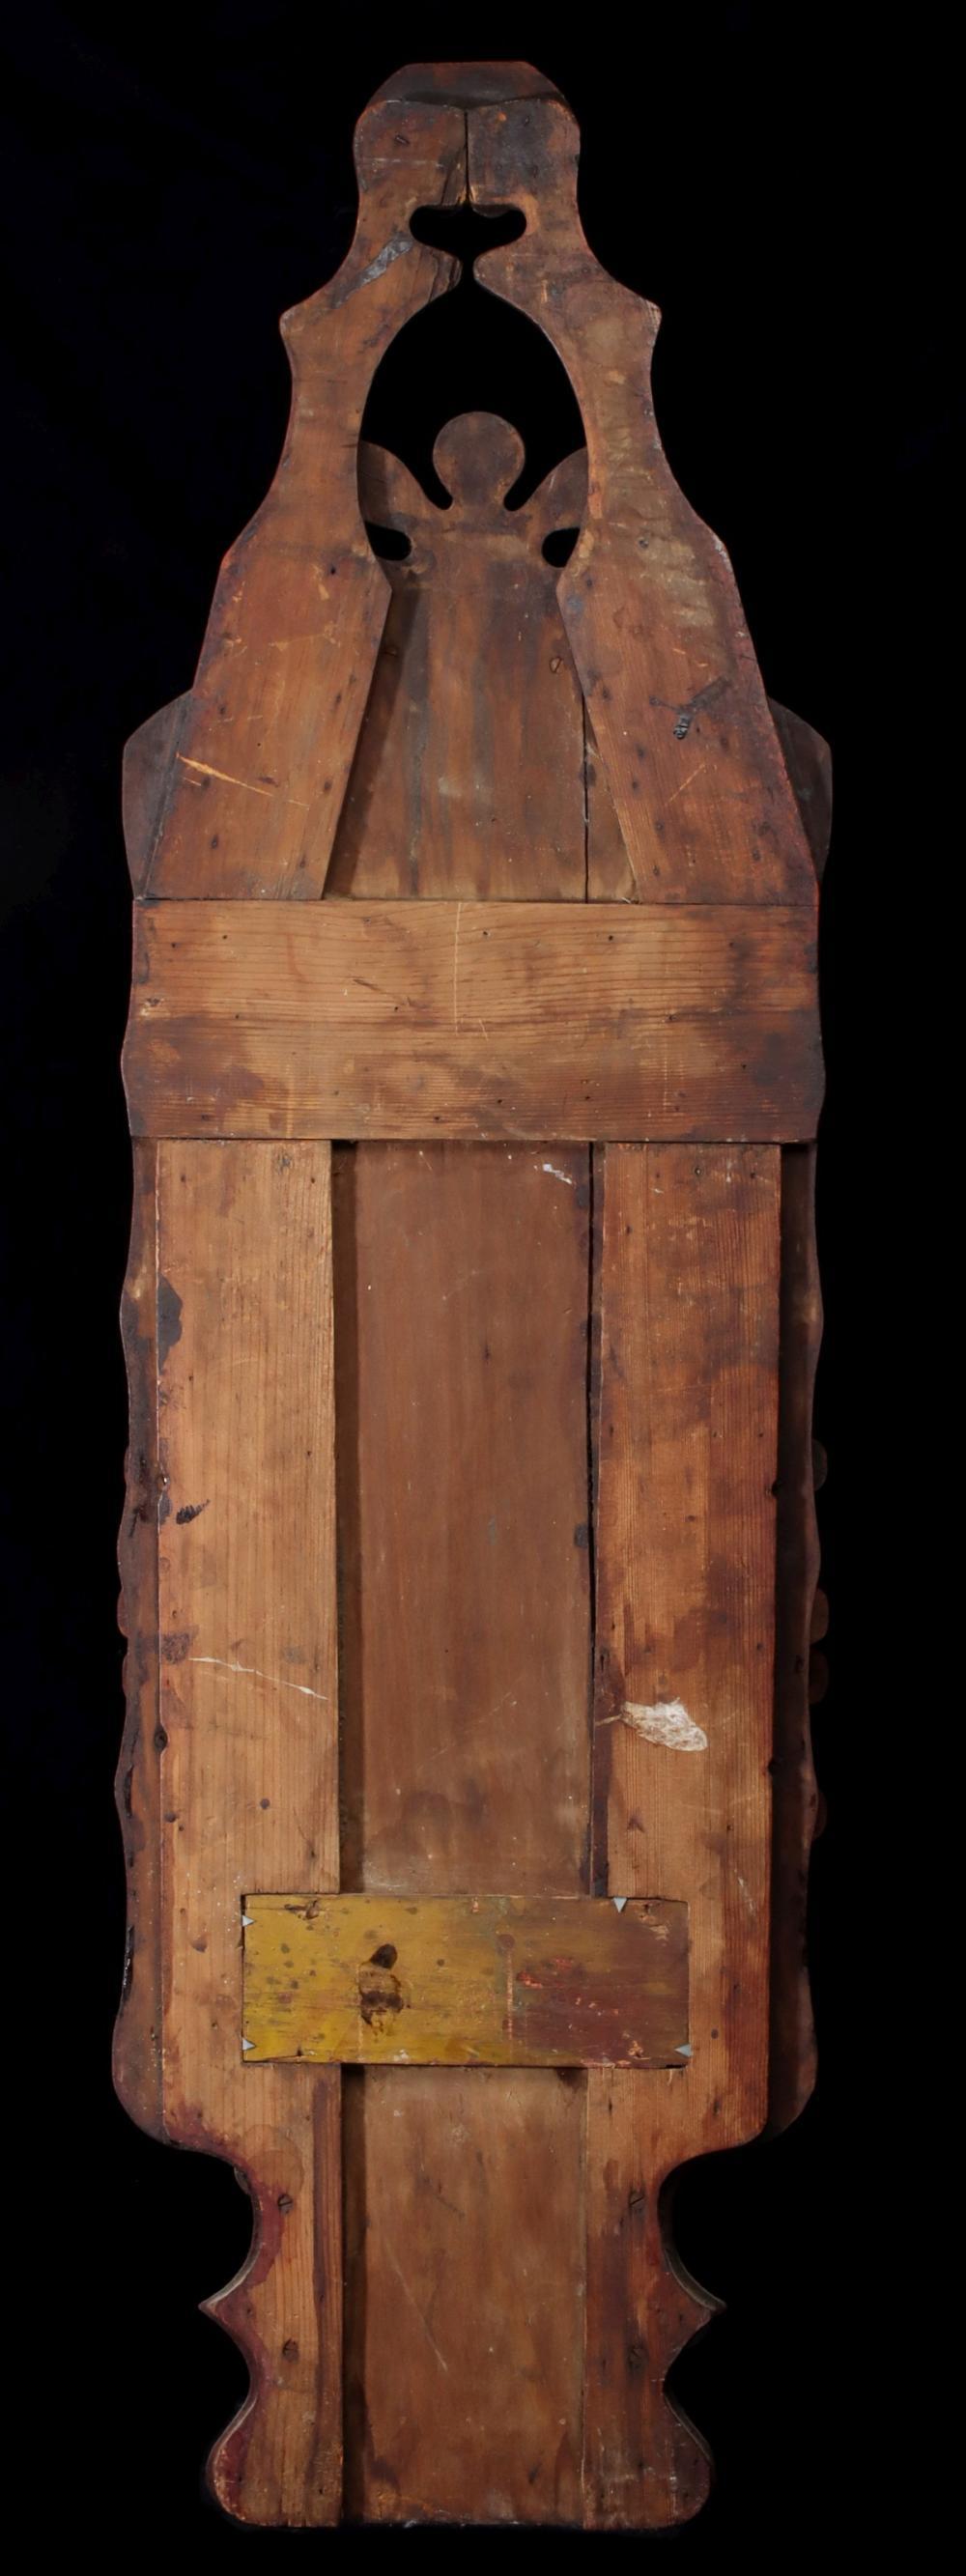 AN ELABORATE MULTI-TIER TRAMP ART WALL BOX/MIRROR